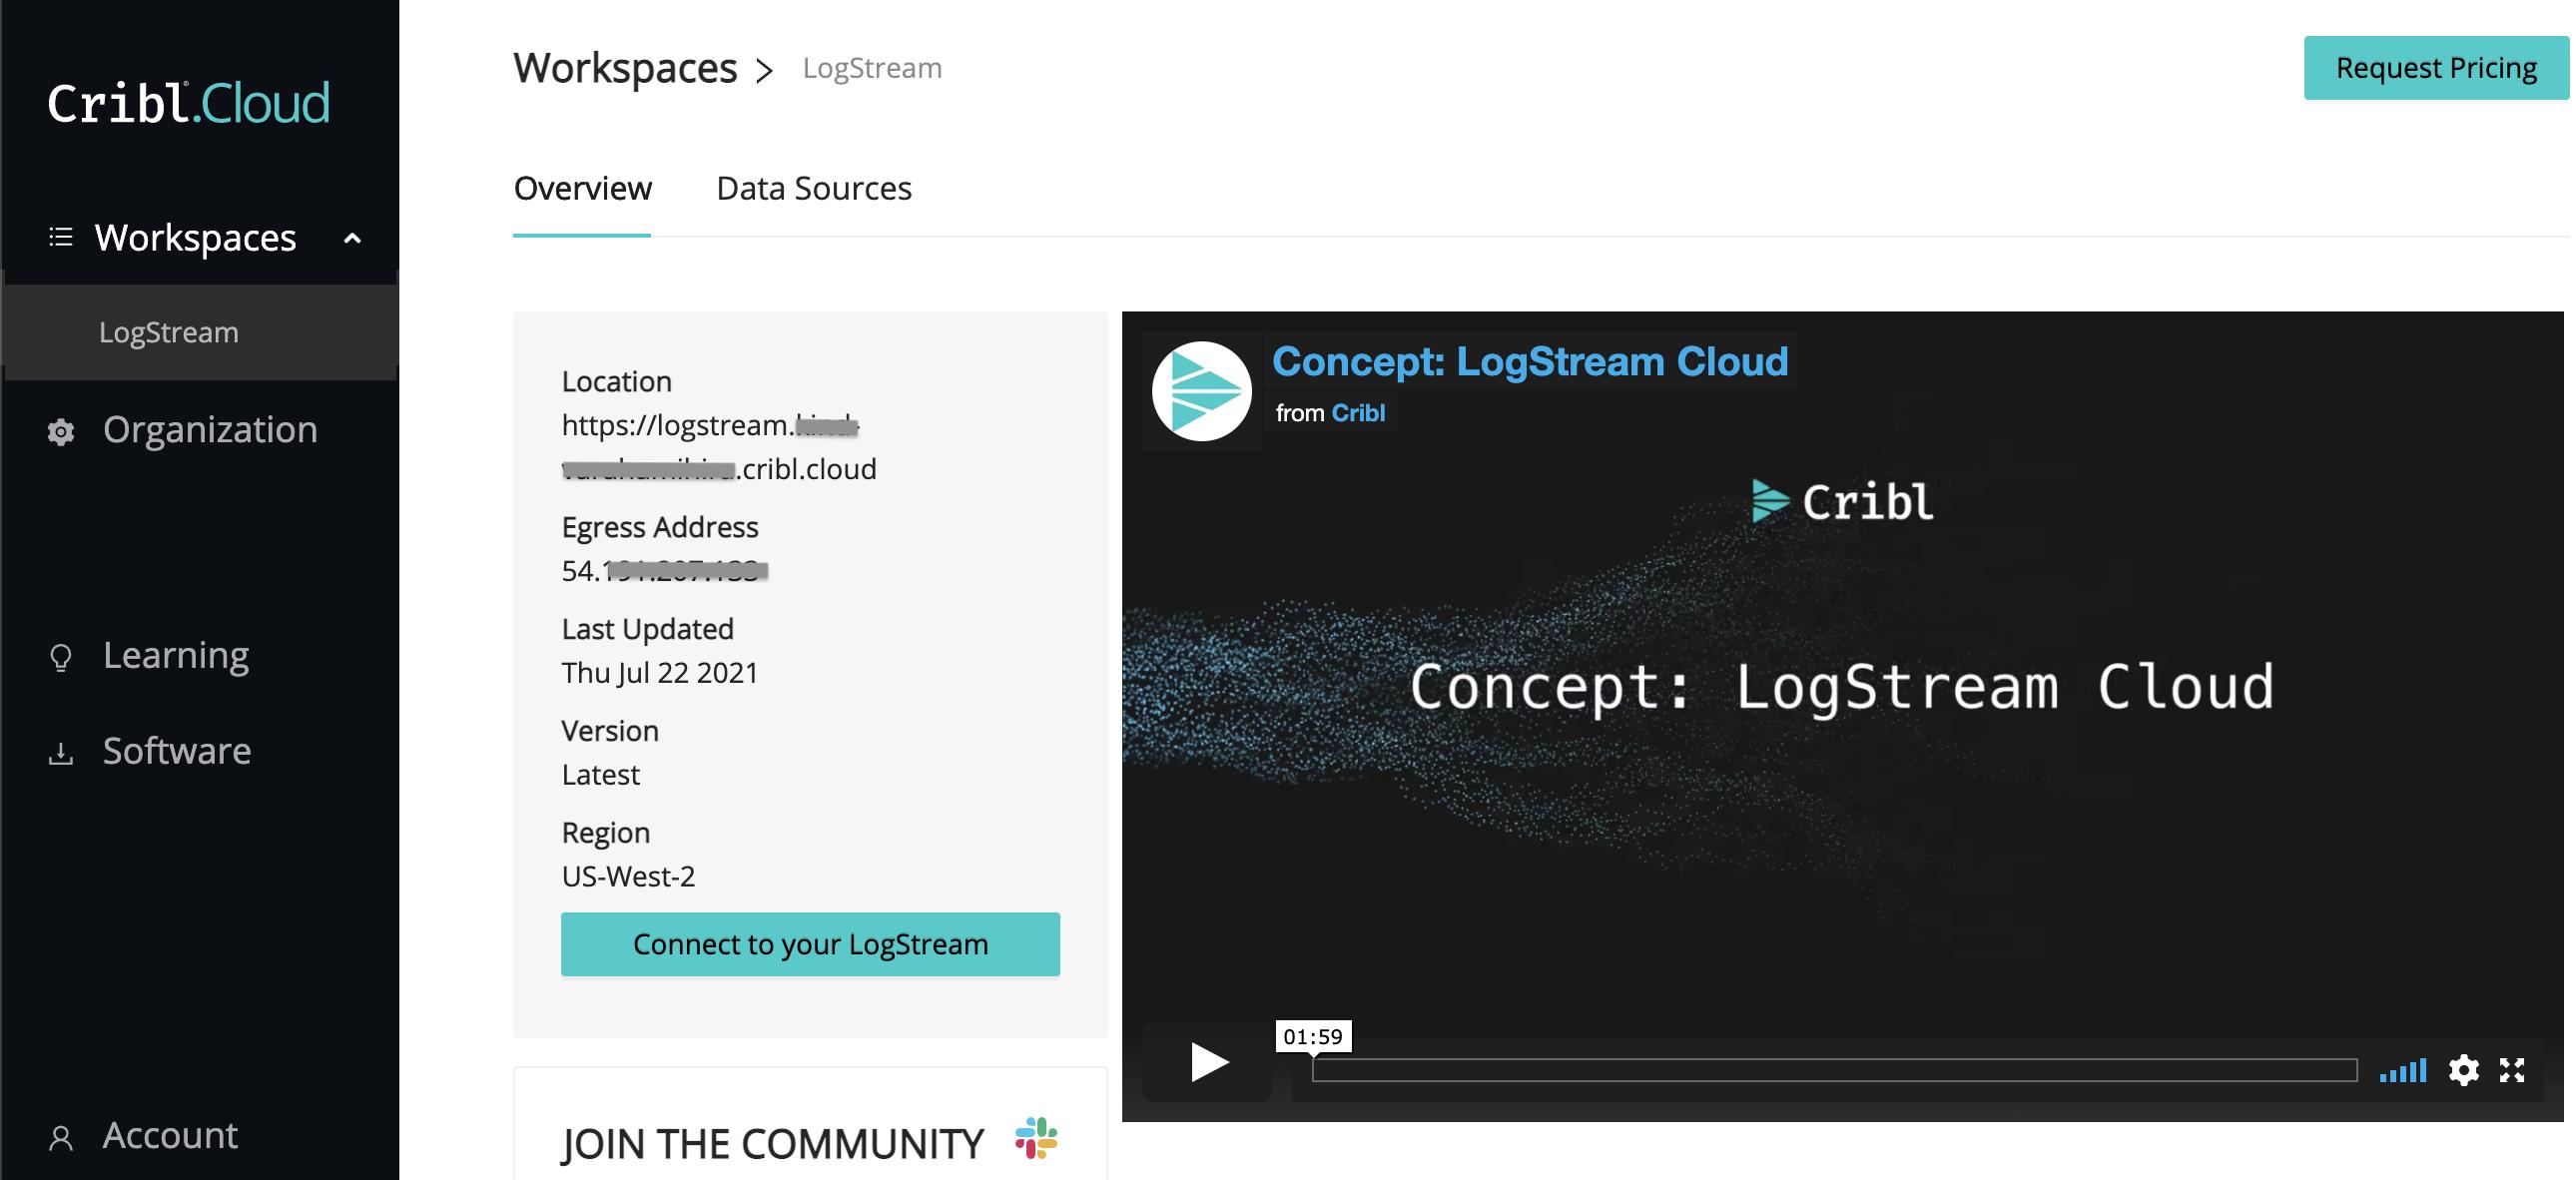 Workspaces > LogStream – Overviewtab